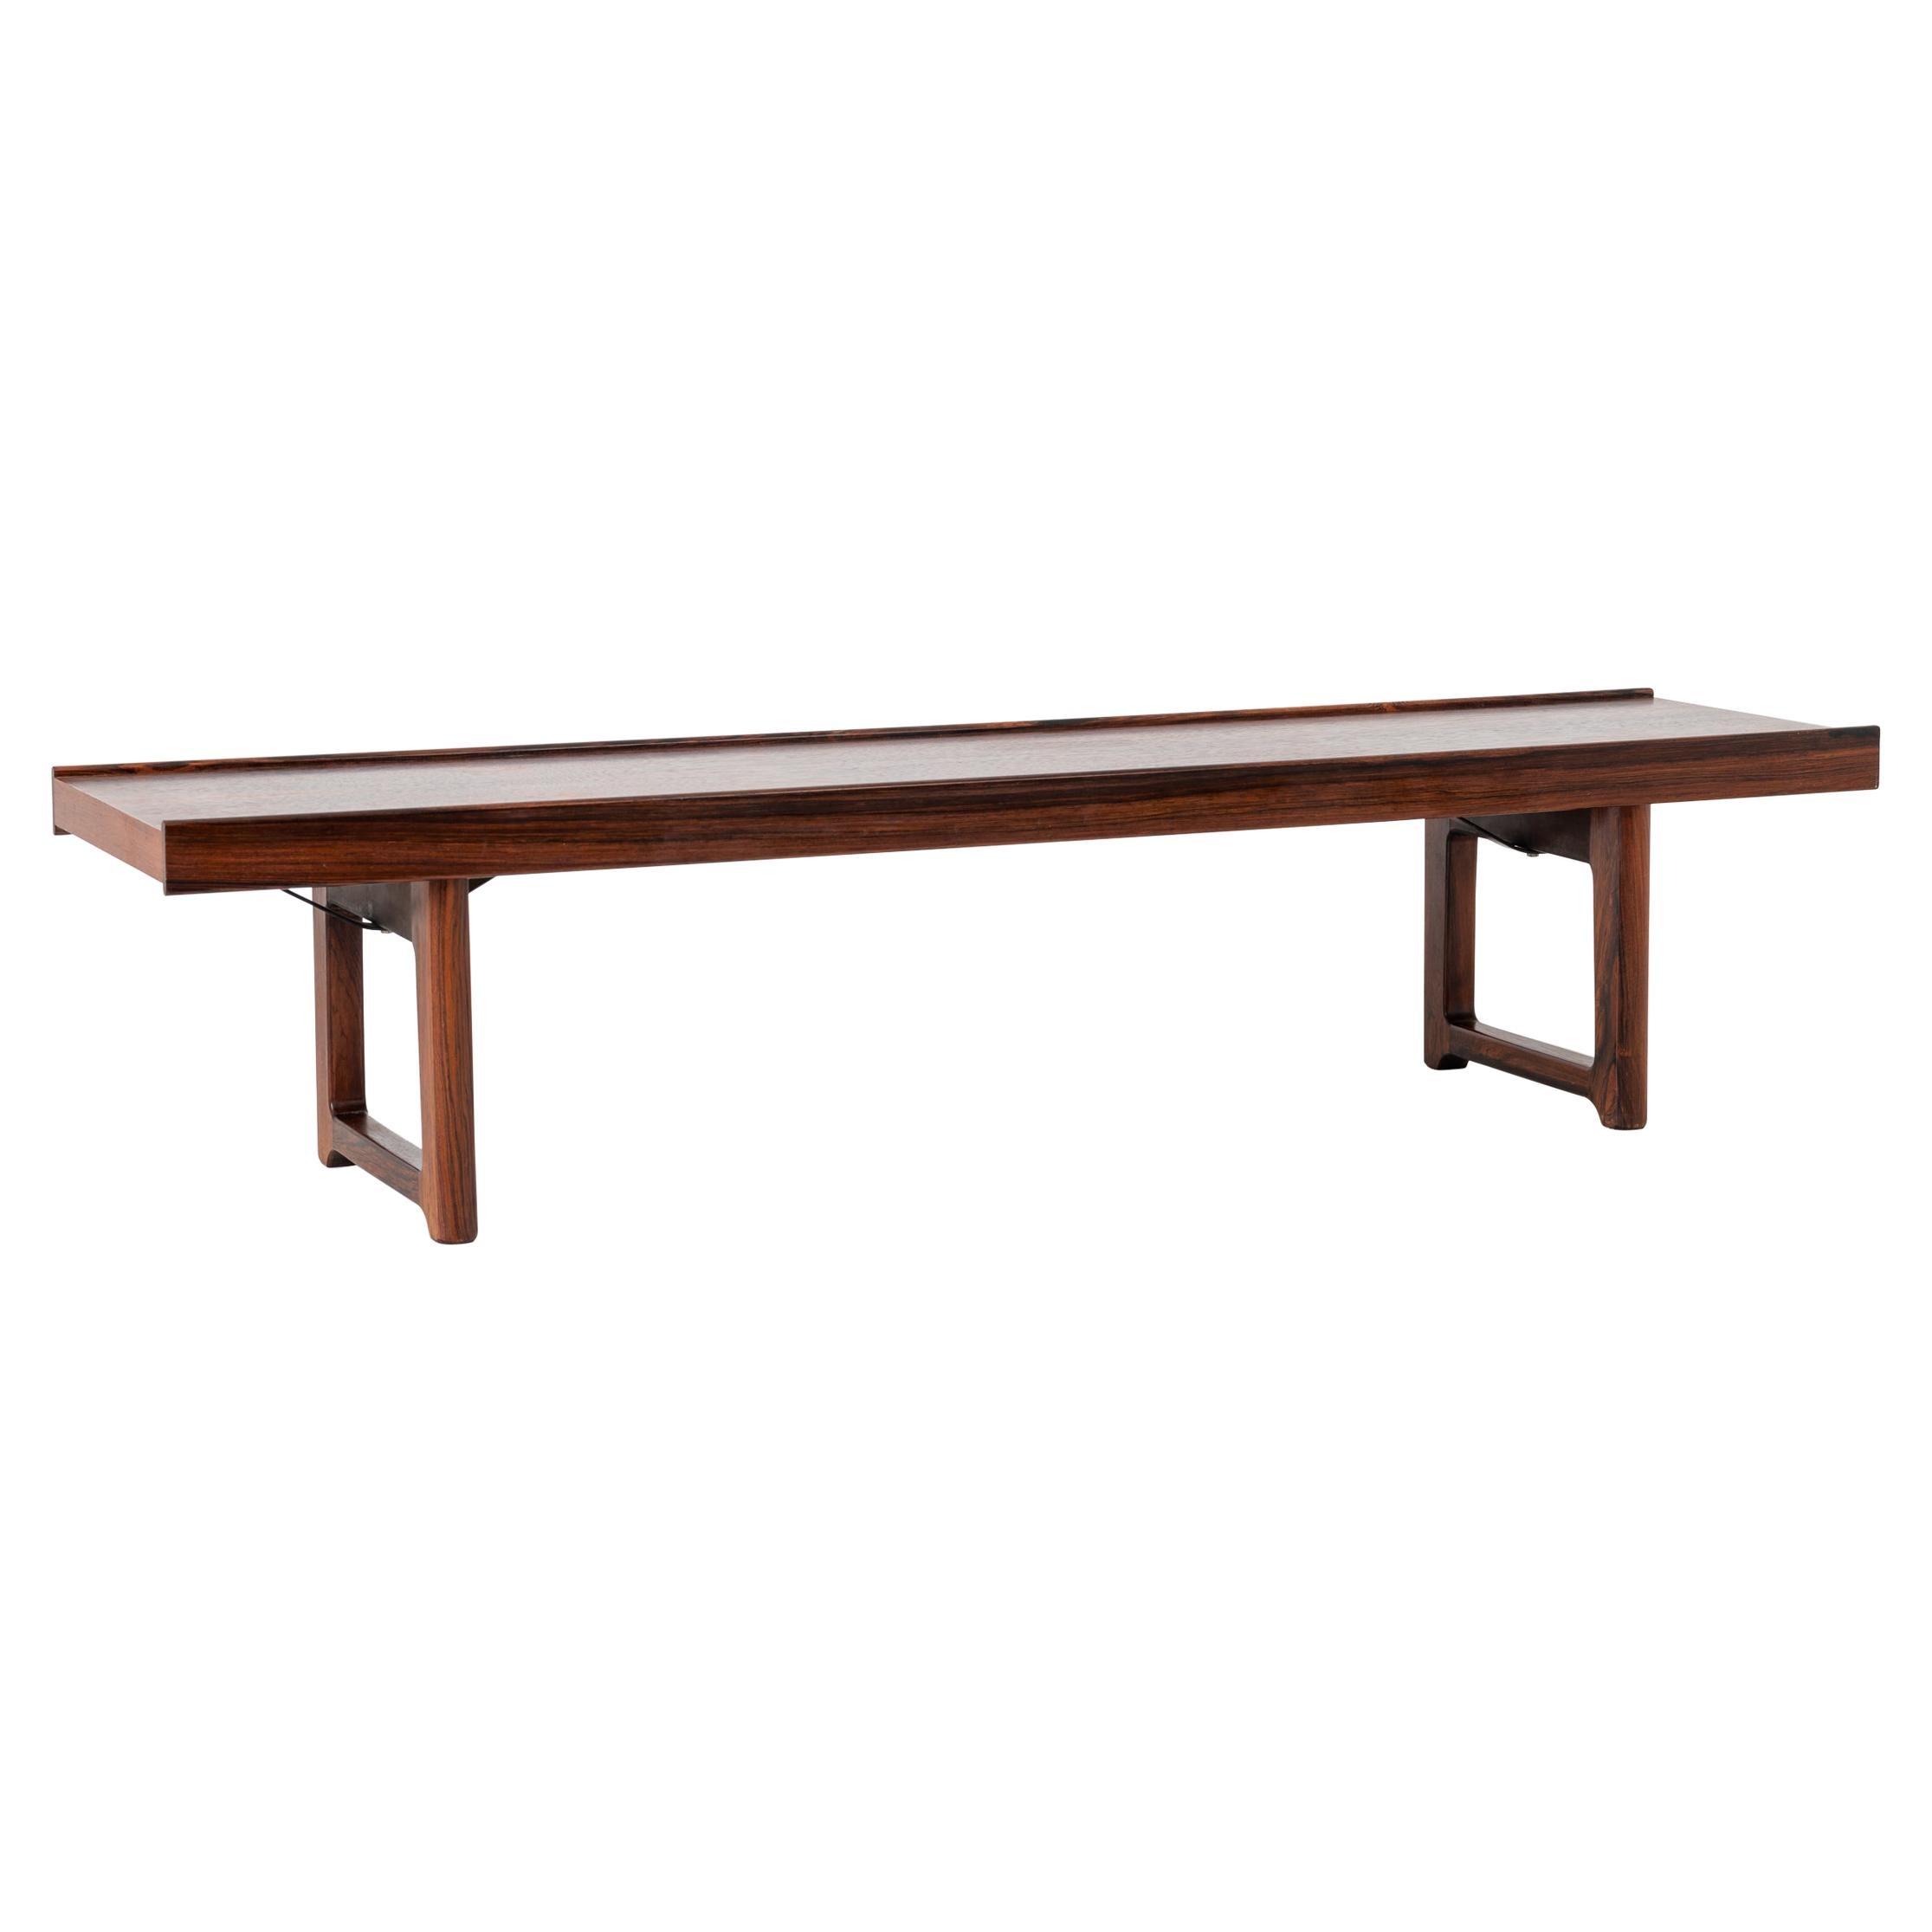 Scandinavian Modern Rosewood Bench by Torbjørn Afdal for Bruksbo